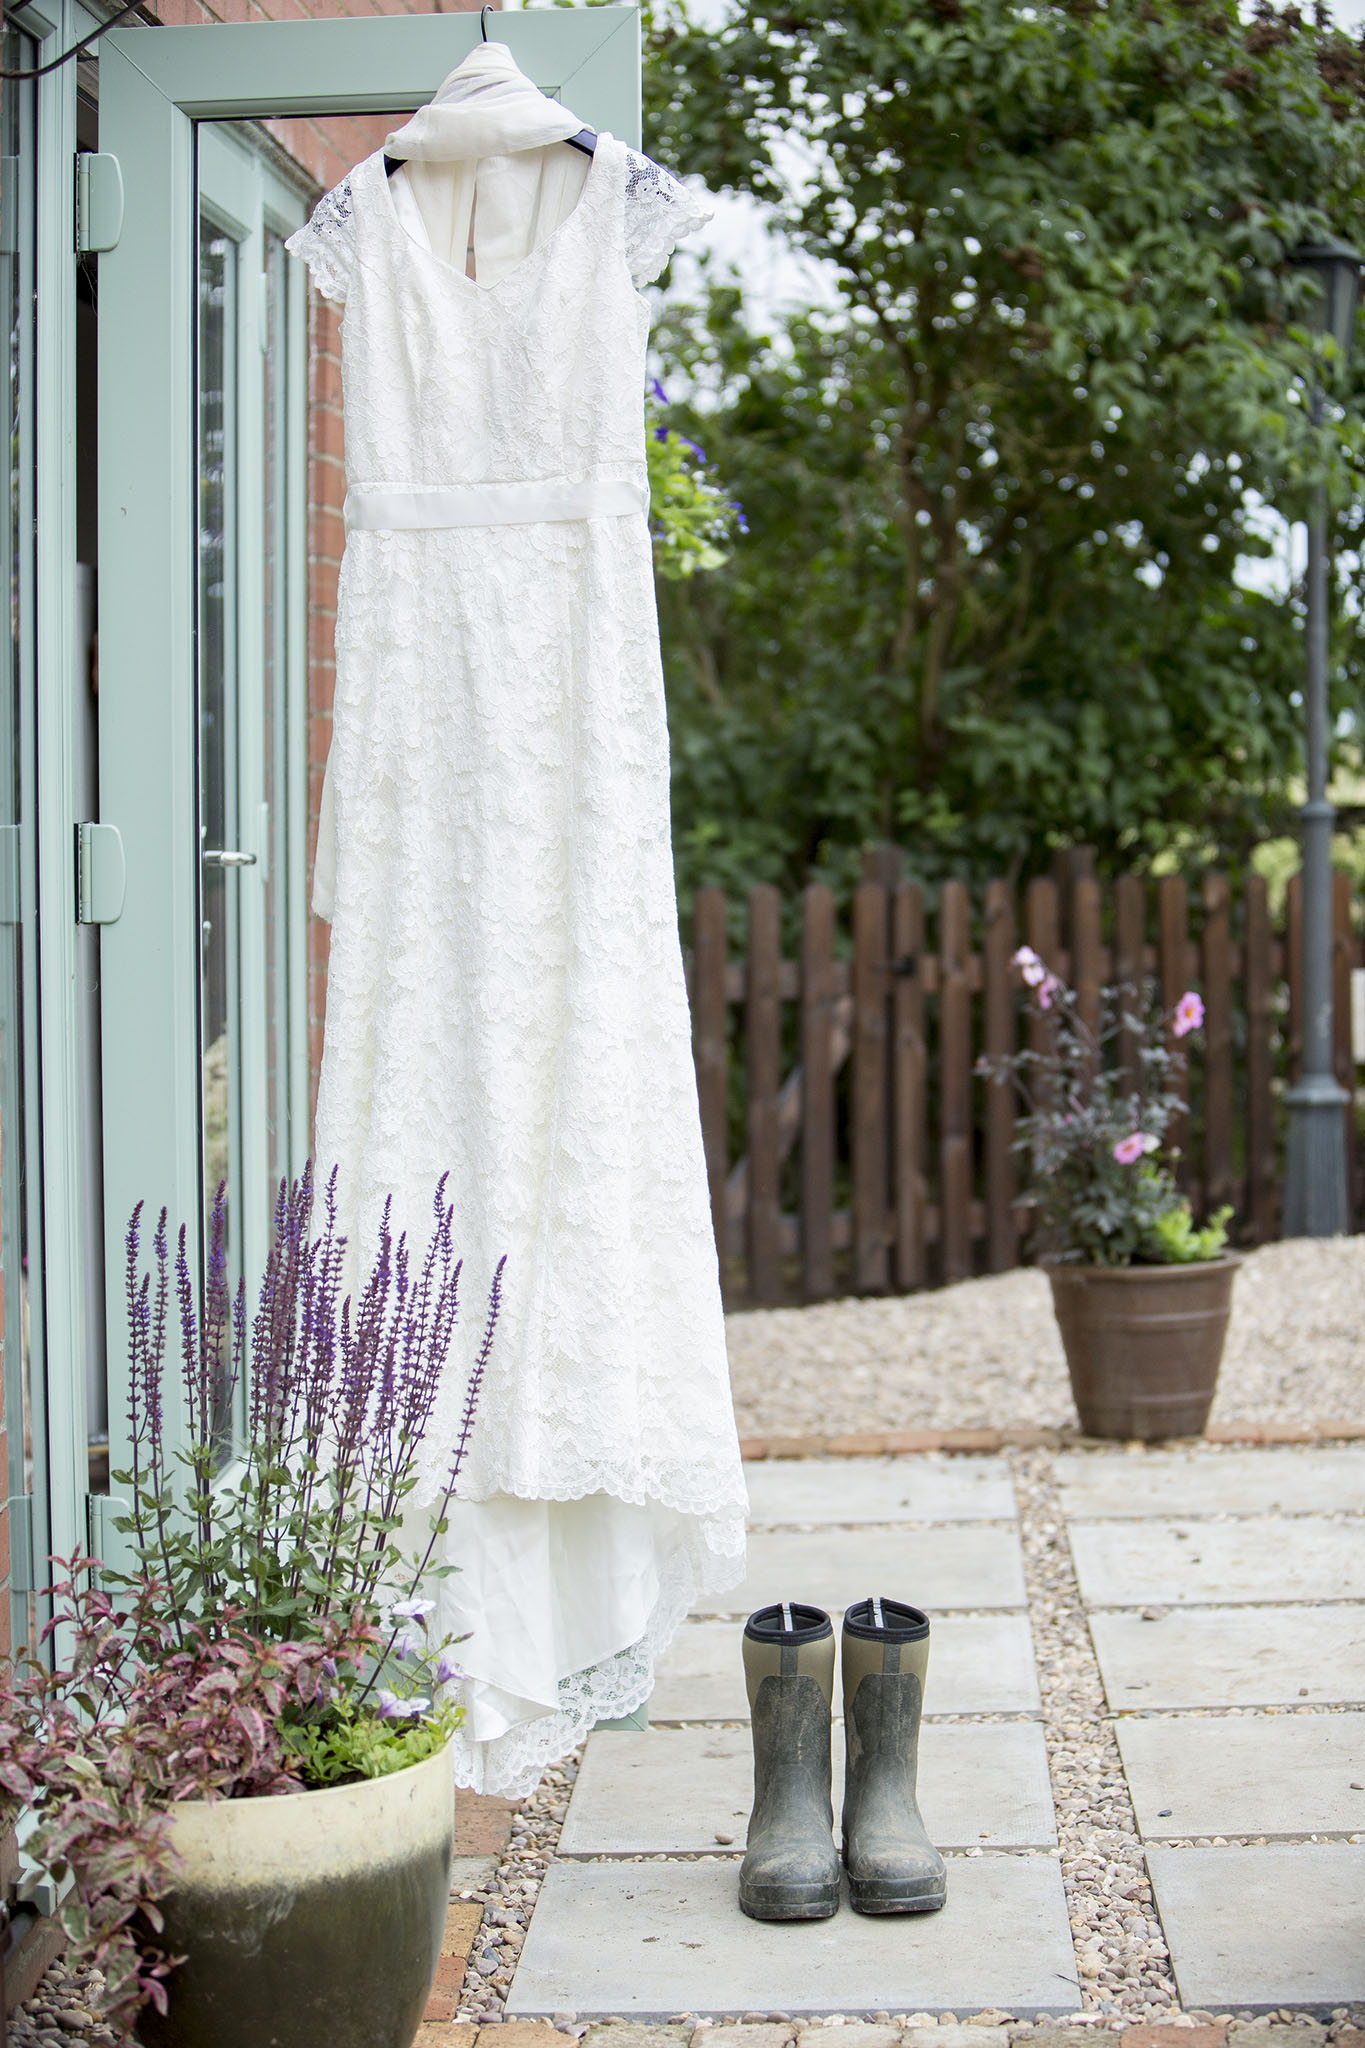 elizabethgphotography_kingslangley_hertfordshire_fineart_wedding_photography_lincolnshire_anna_simon_03.jpg